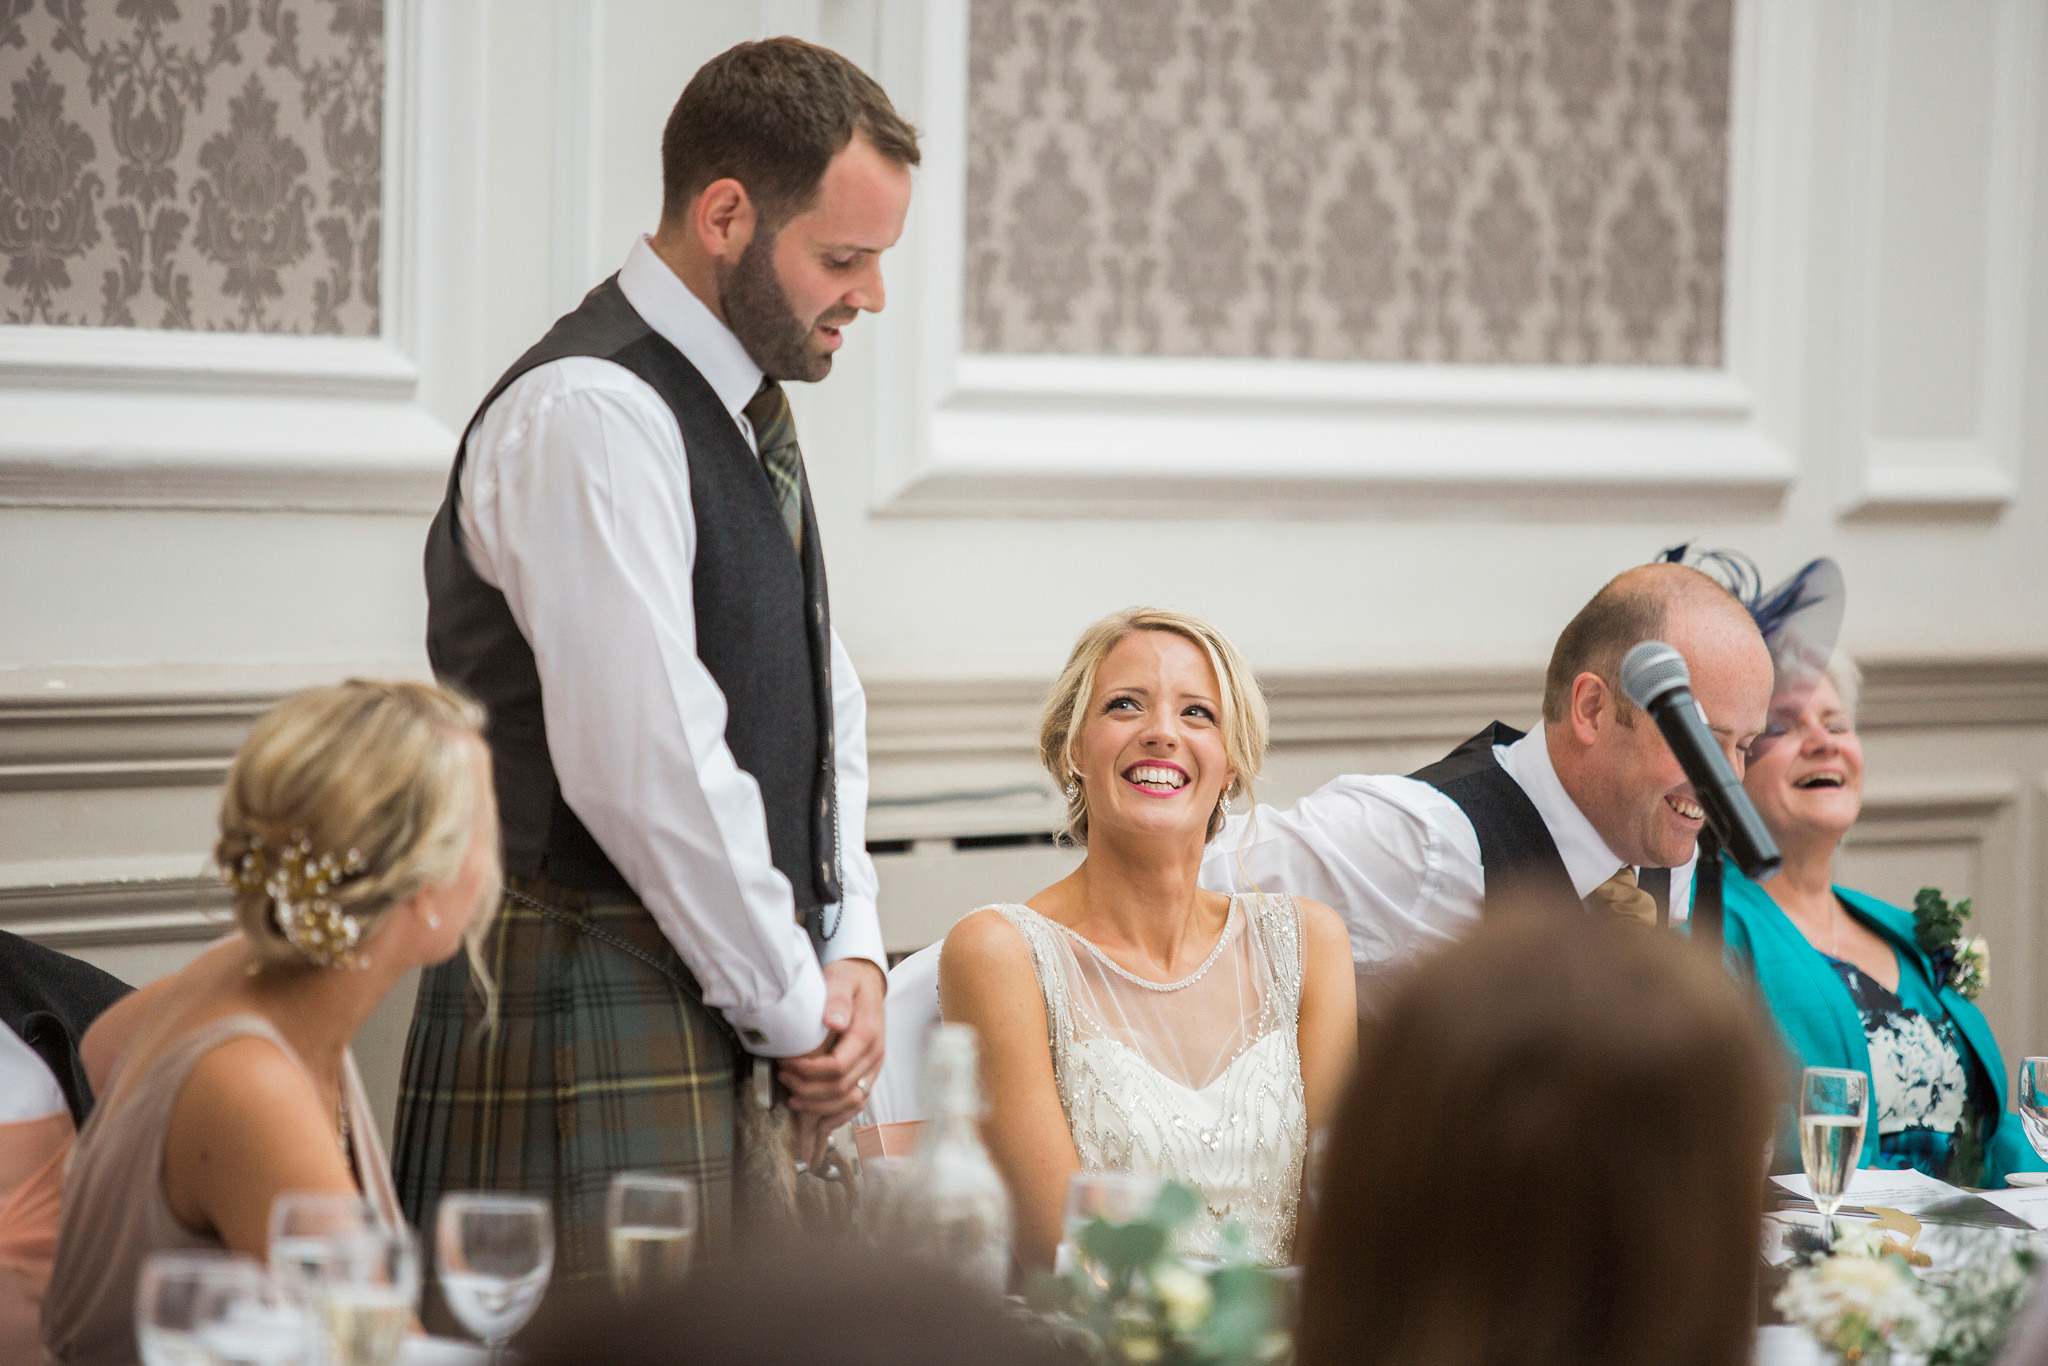 104-desination-wedding-photographer-scotland.jpg